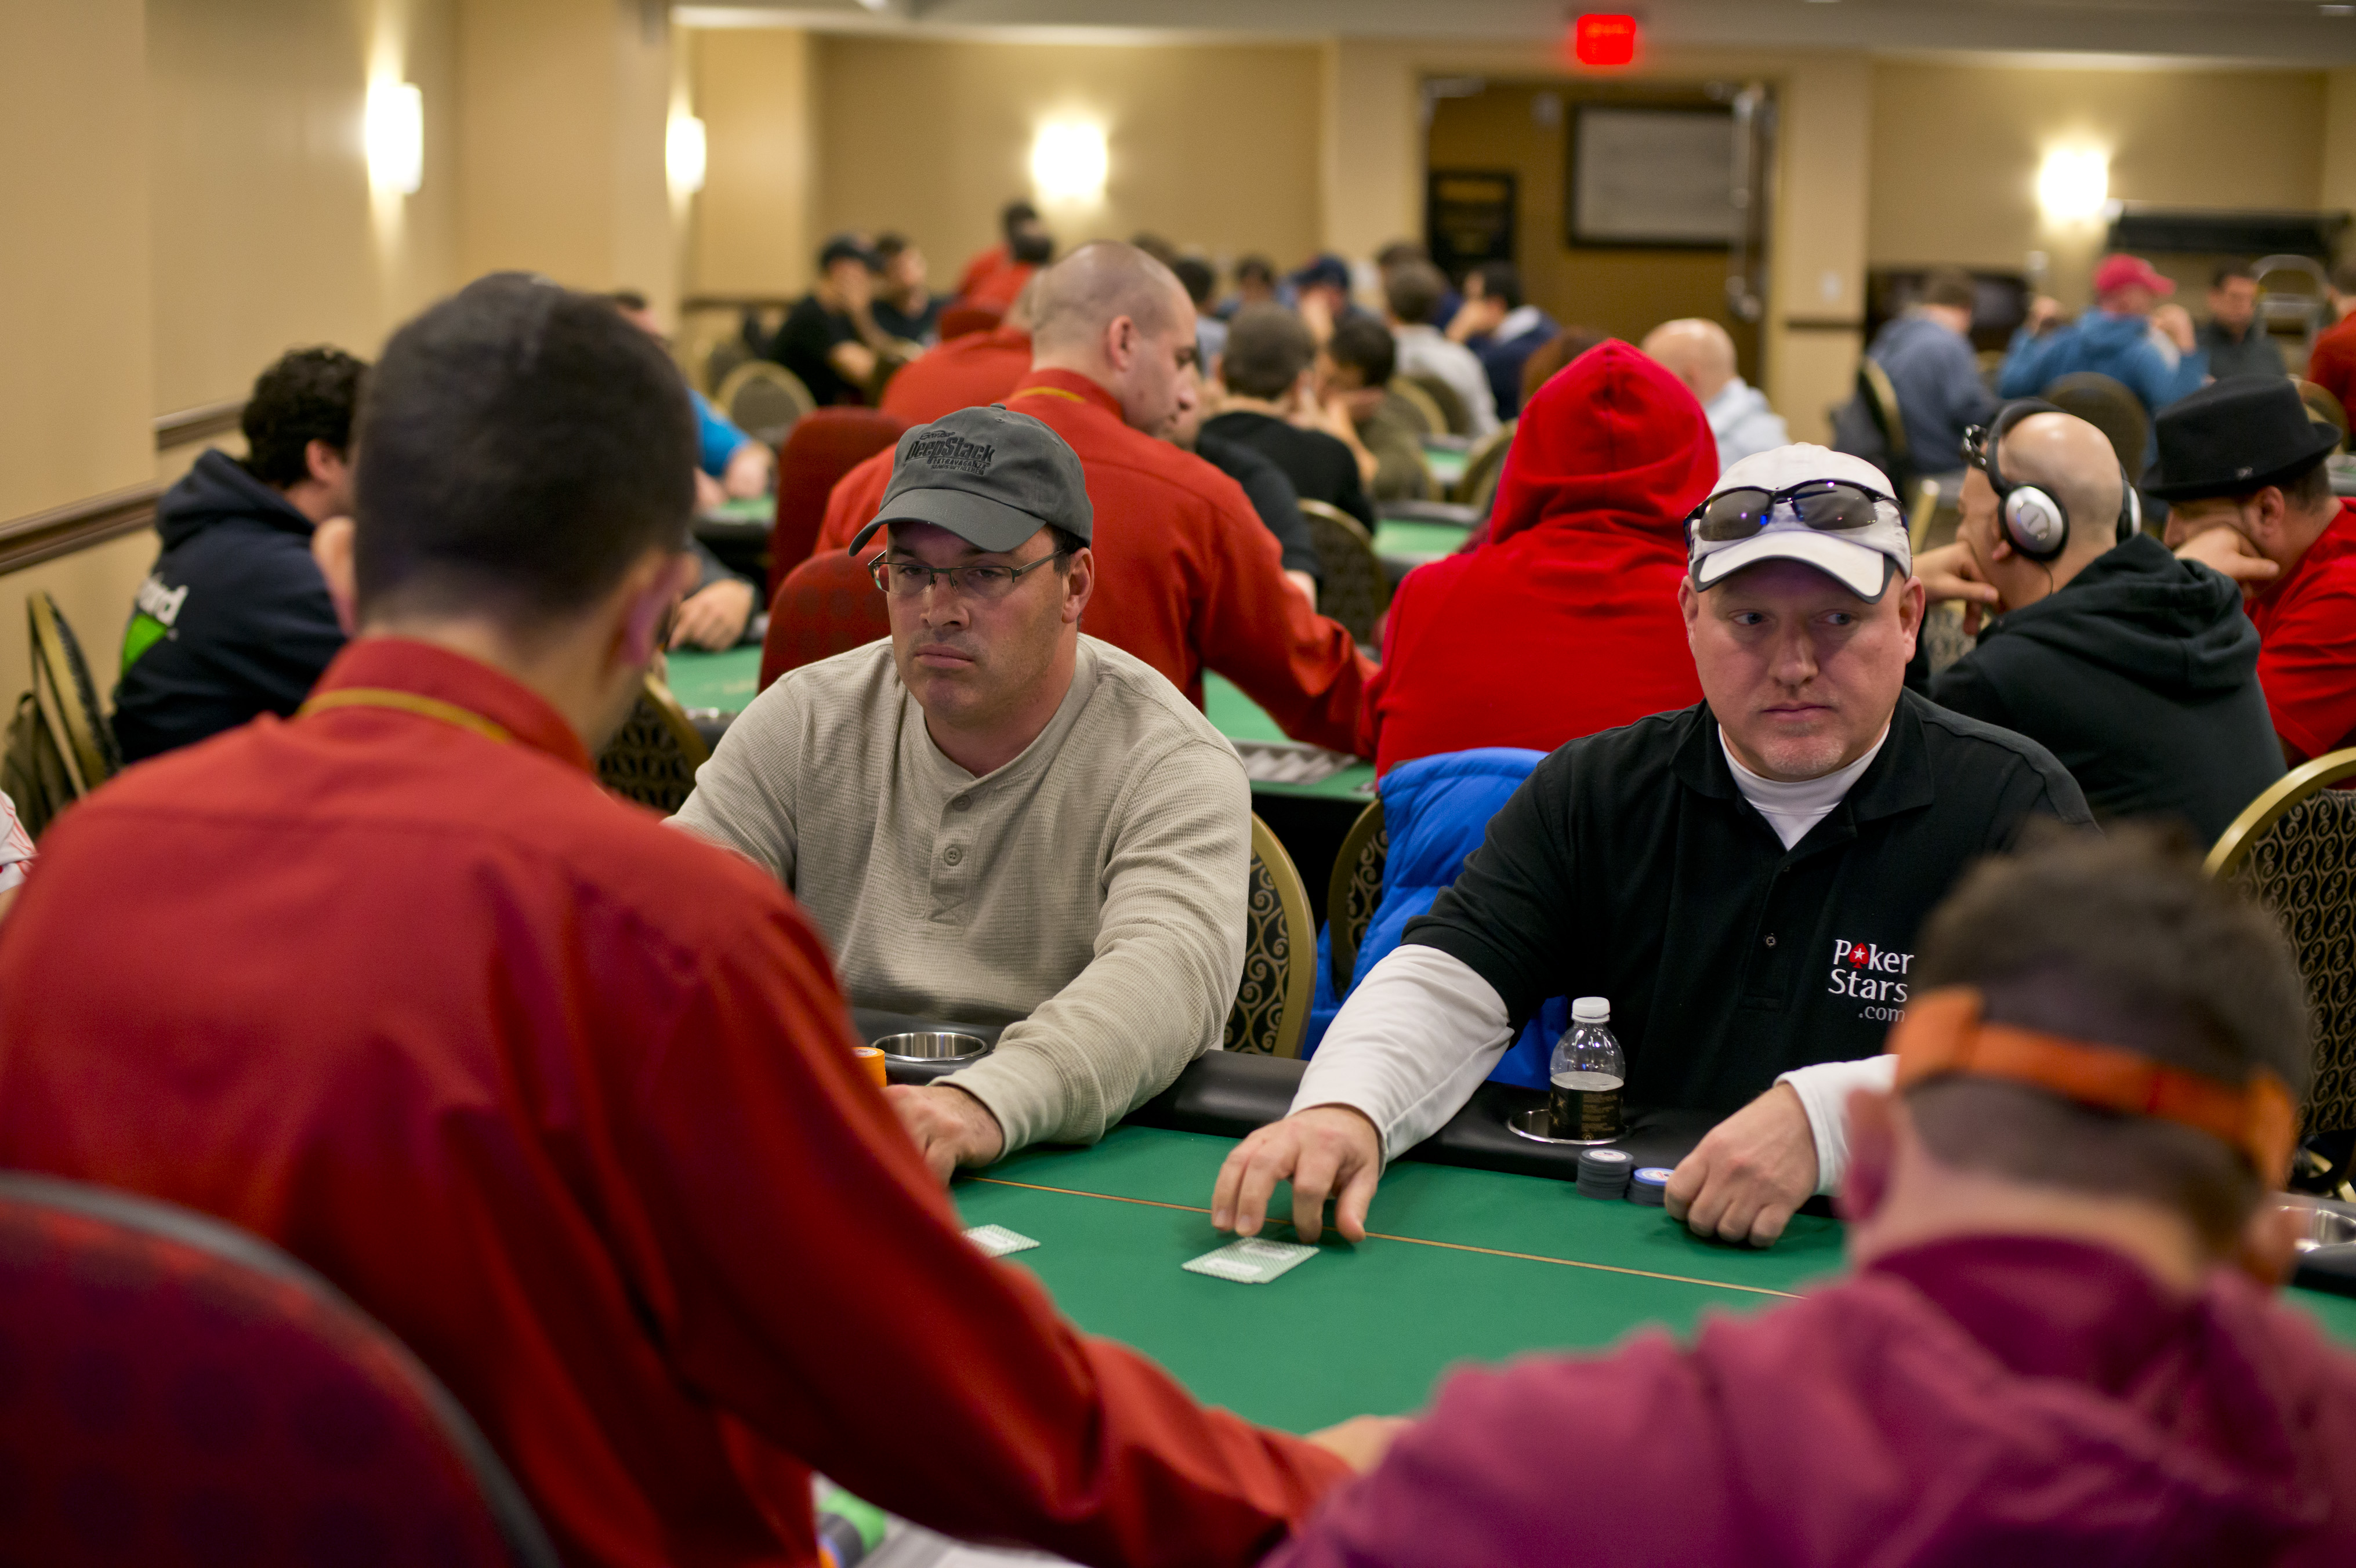 Poker small ball cash games no deposit bonus codes mobile